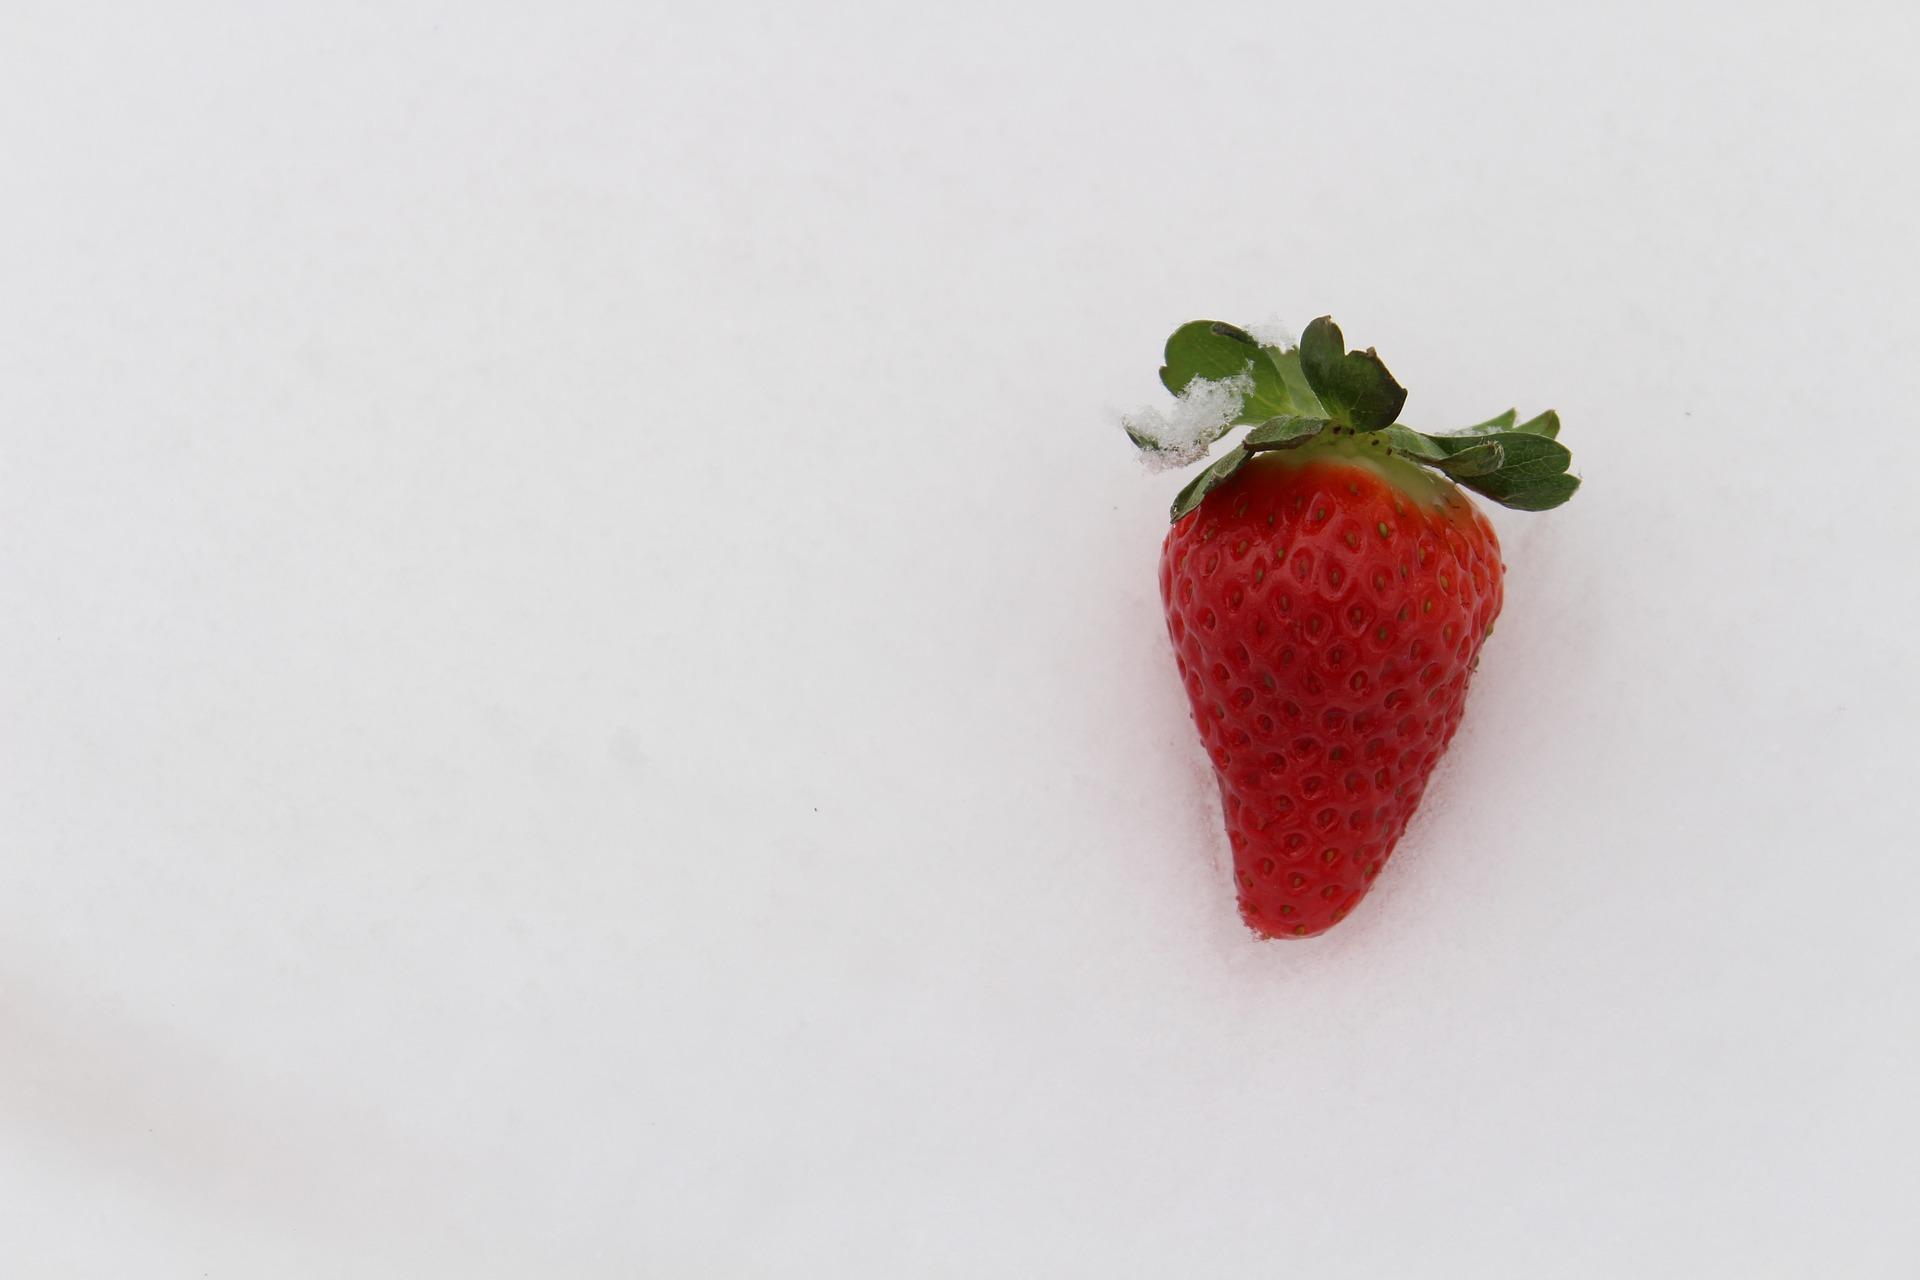 Erdbeere im Schnee